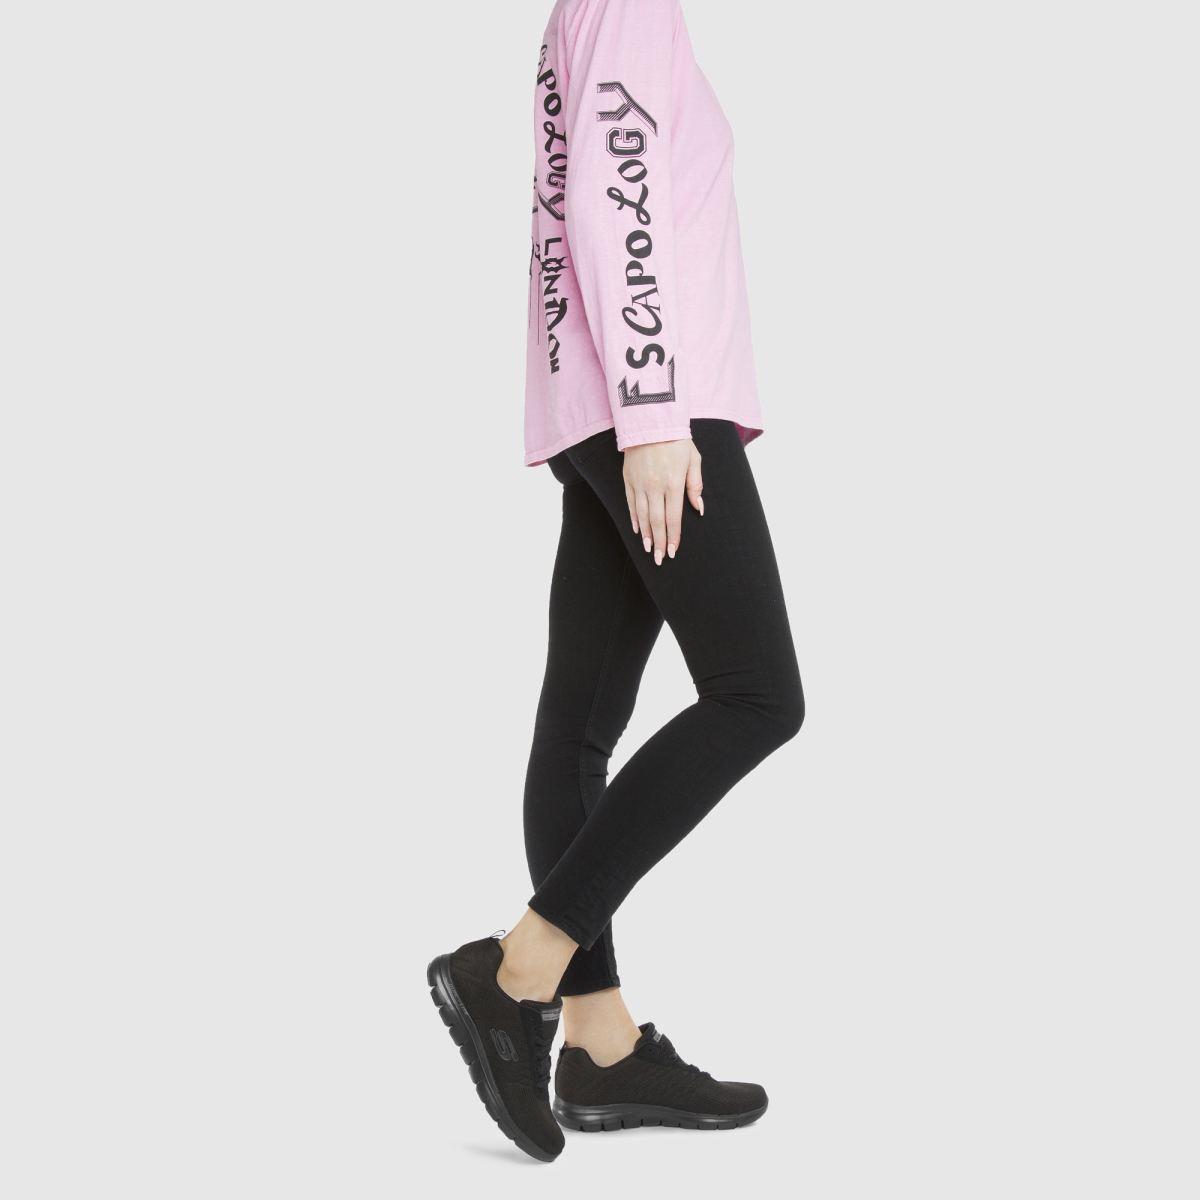 Damen Schwarz skechers Flex Appeal 2.0 Break Free Sneaker | schuh Gute Qualität beliebte Schuhe